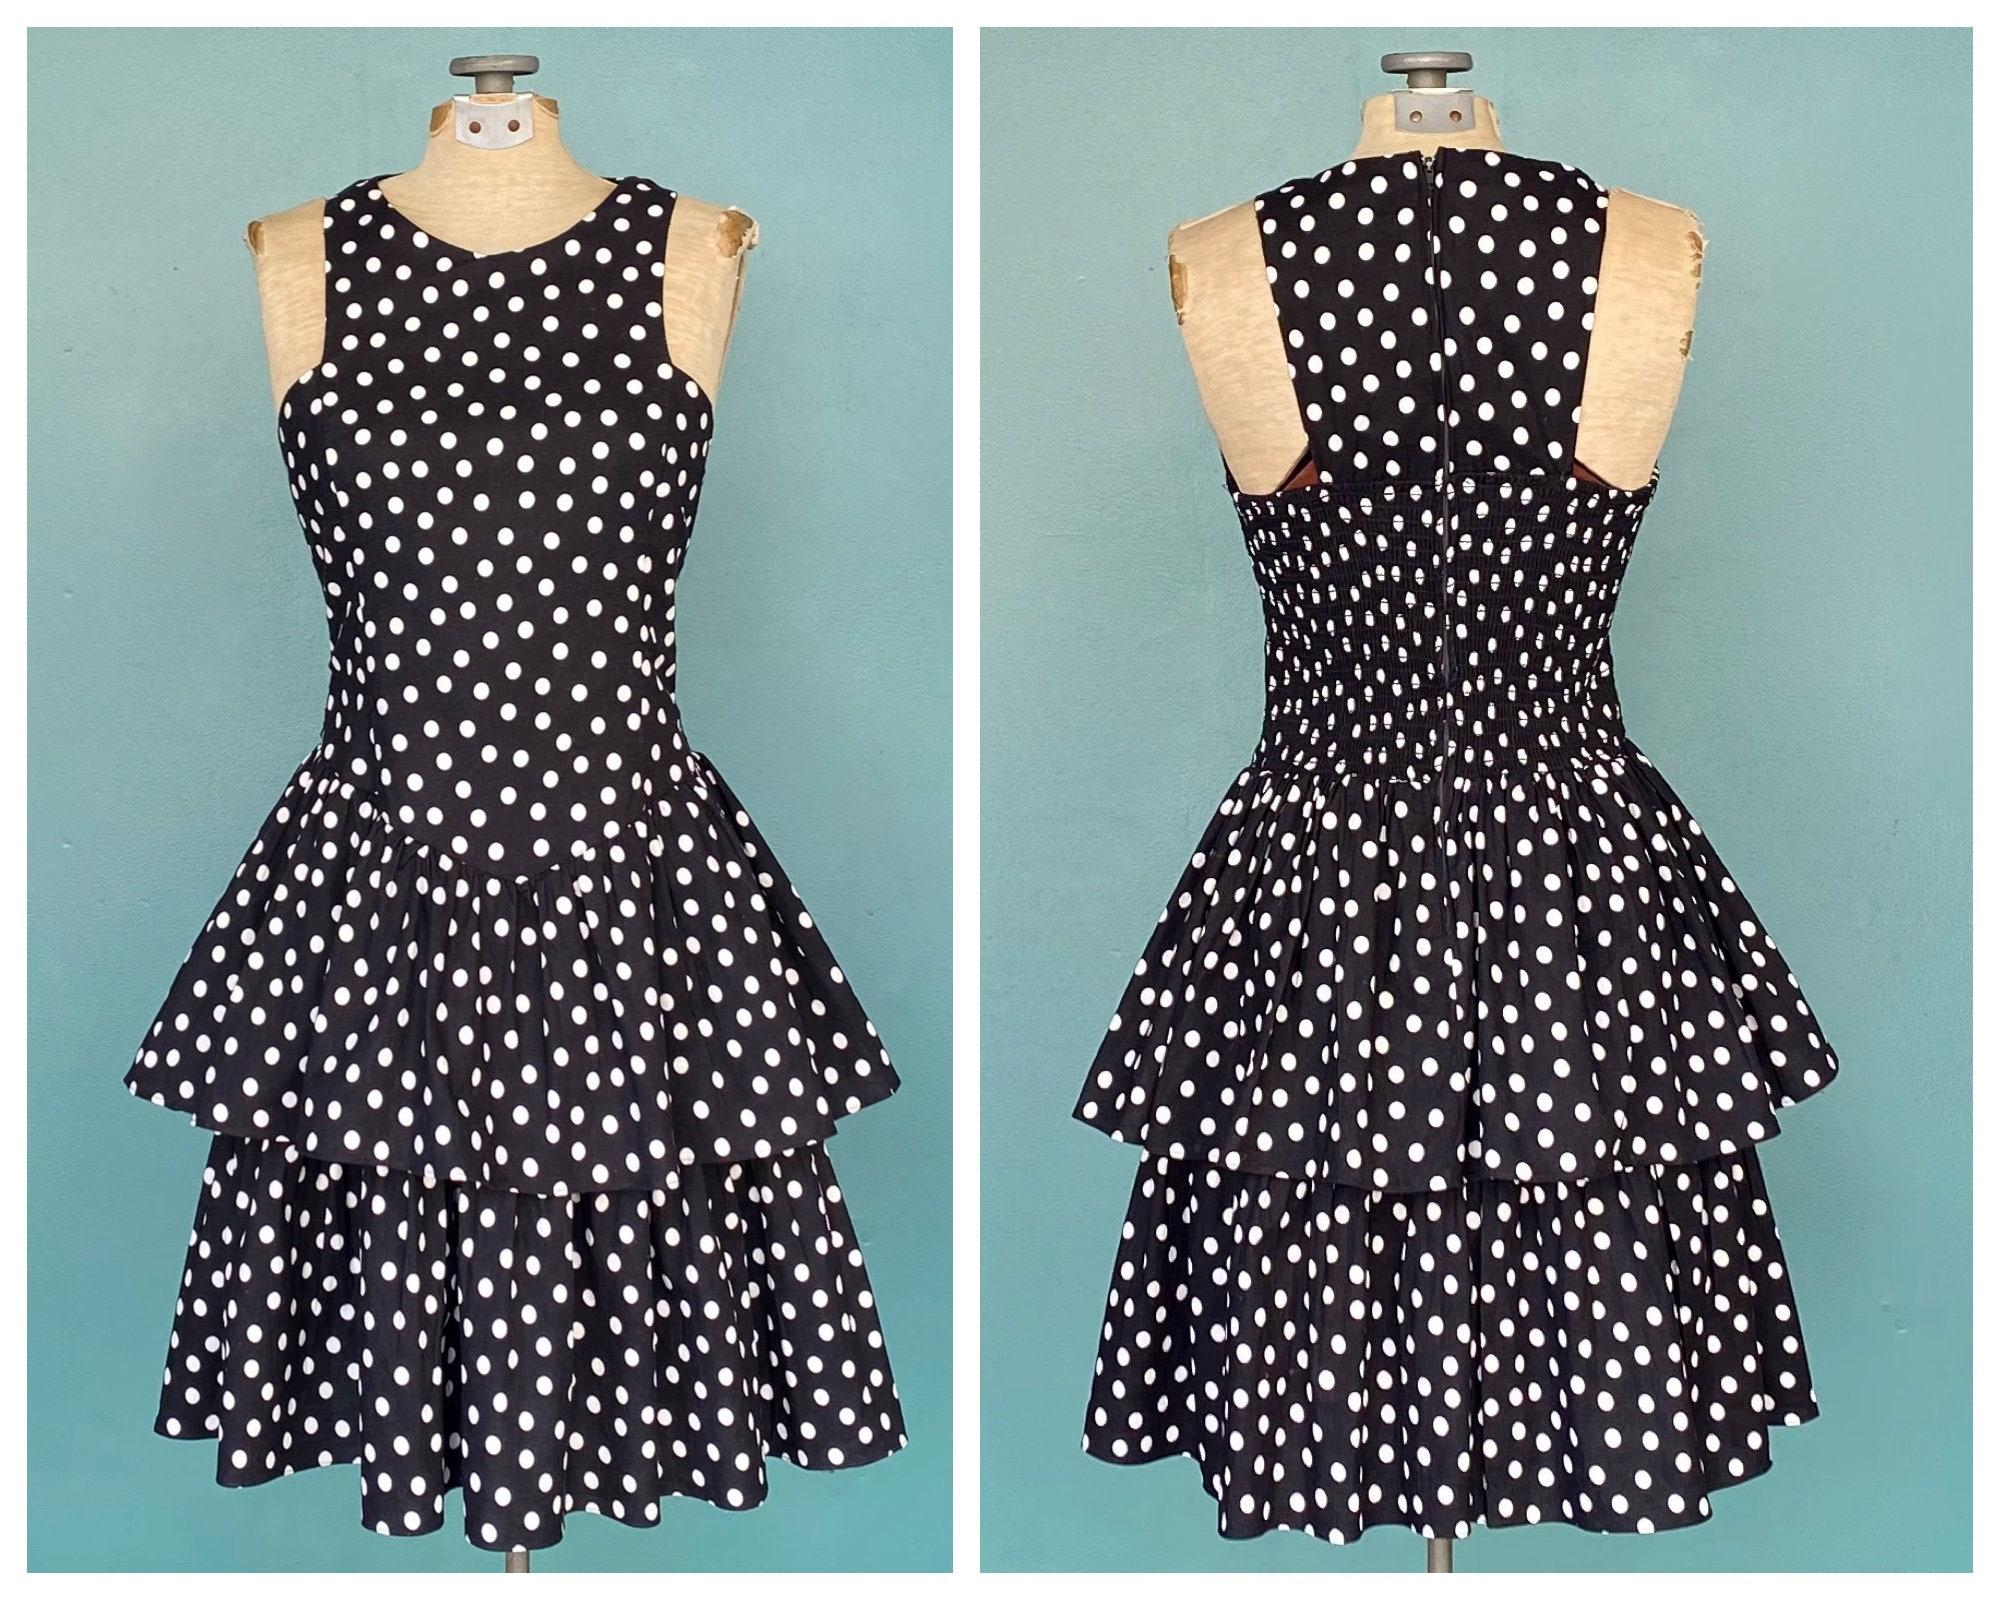 80s Dresses | Casual to Party Dresses Black Polka Dot 80S Cotton Sun Dress Vintage 1980S Sleeveless Day Taralynevansstudio $0.00 AT vintagedancer.com